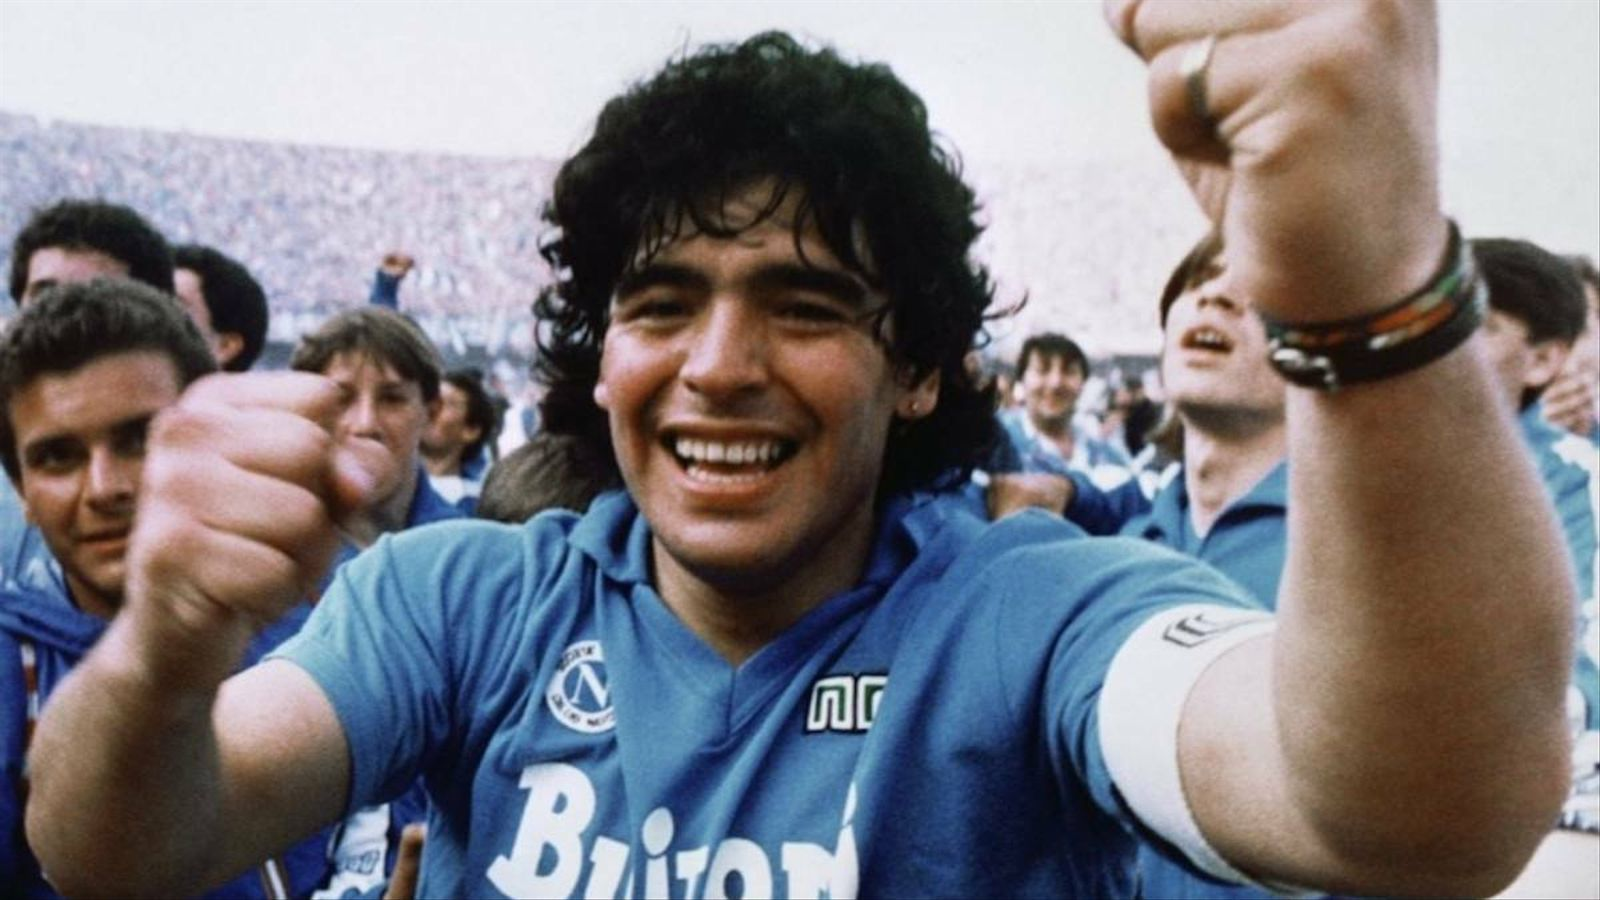 Sort que la pilota no s'embruta, Diego